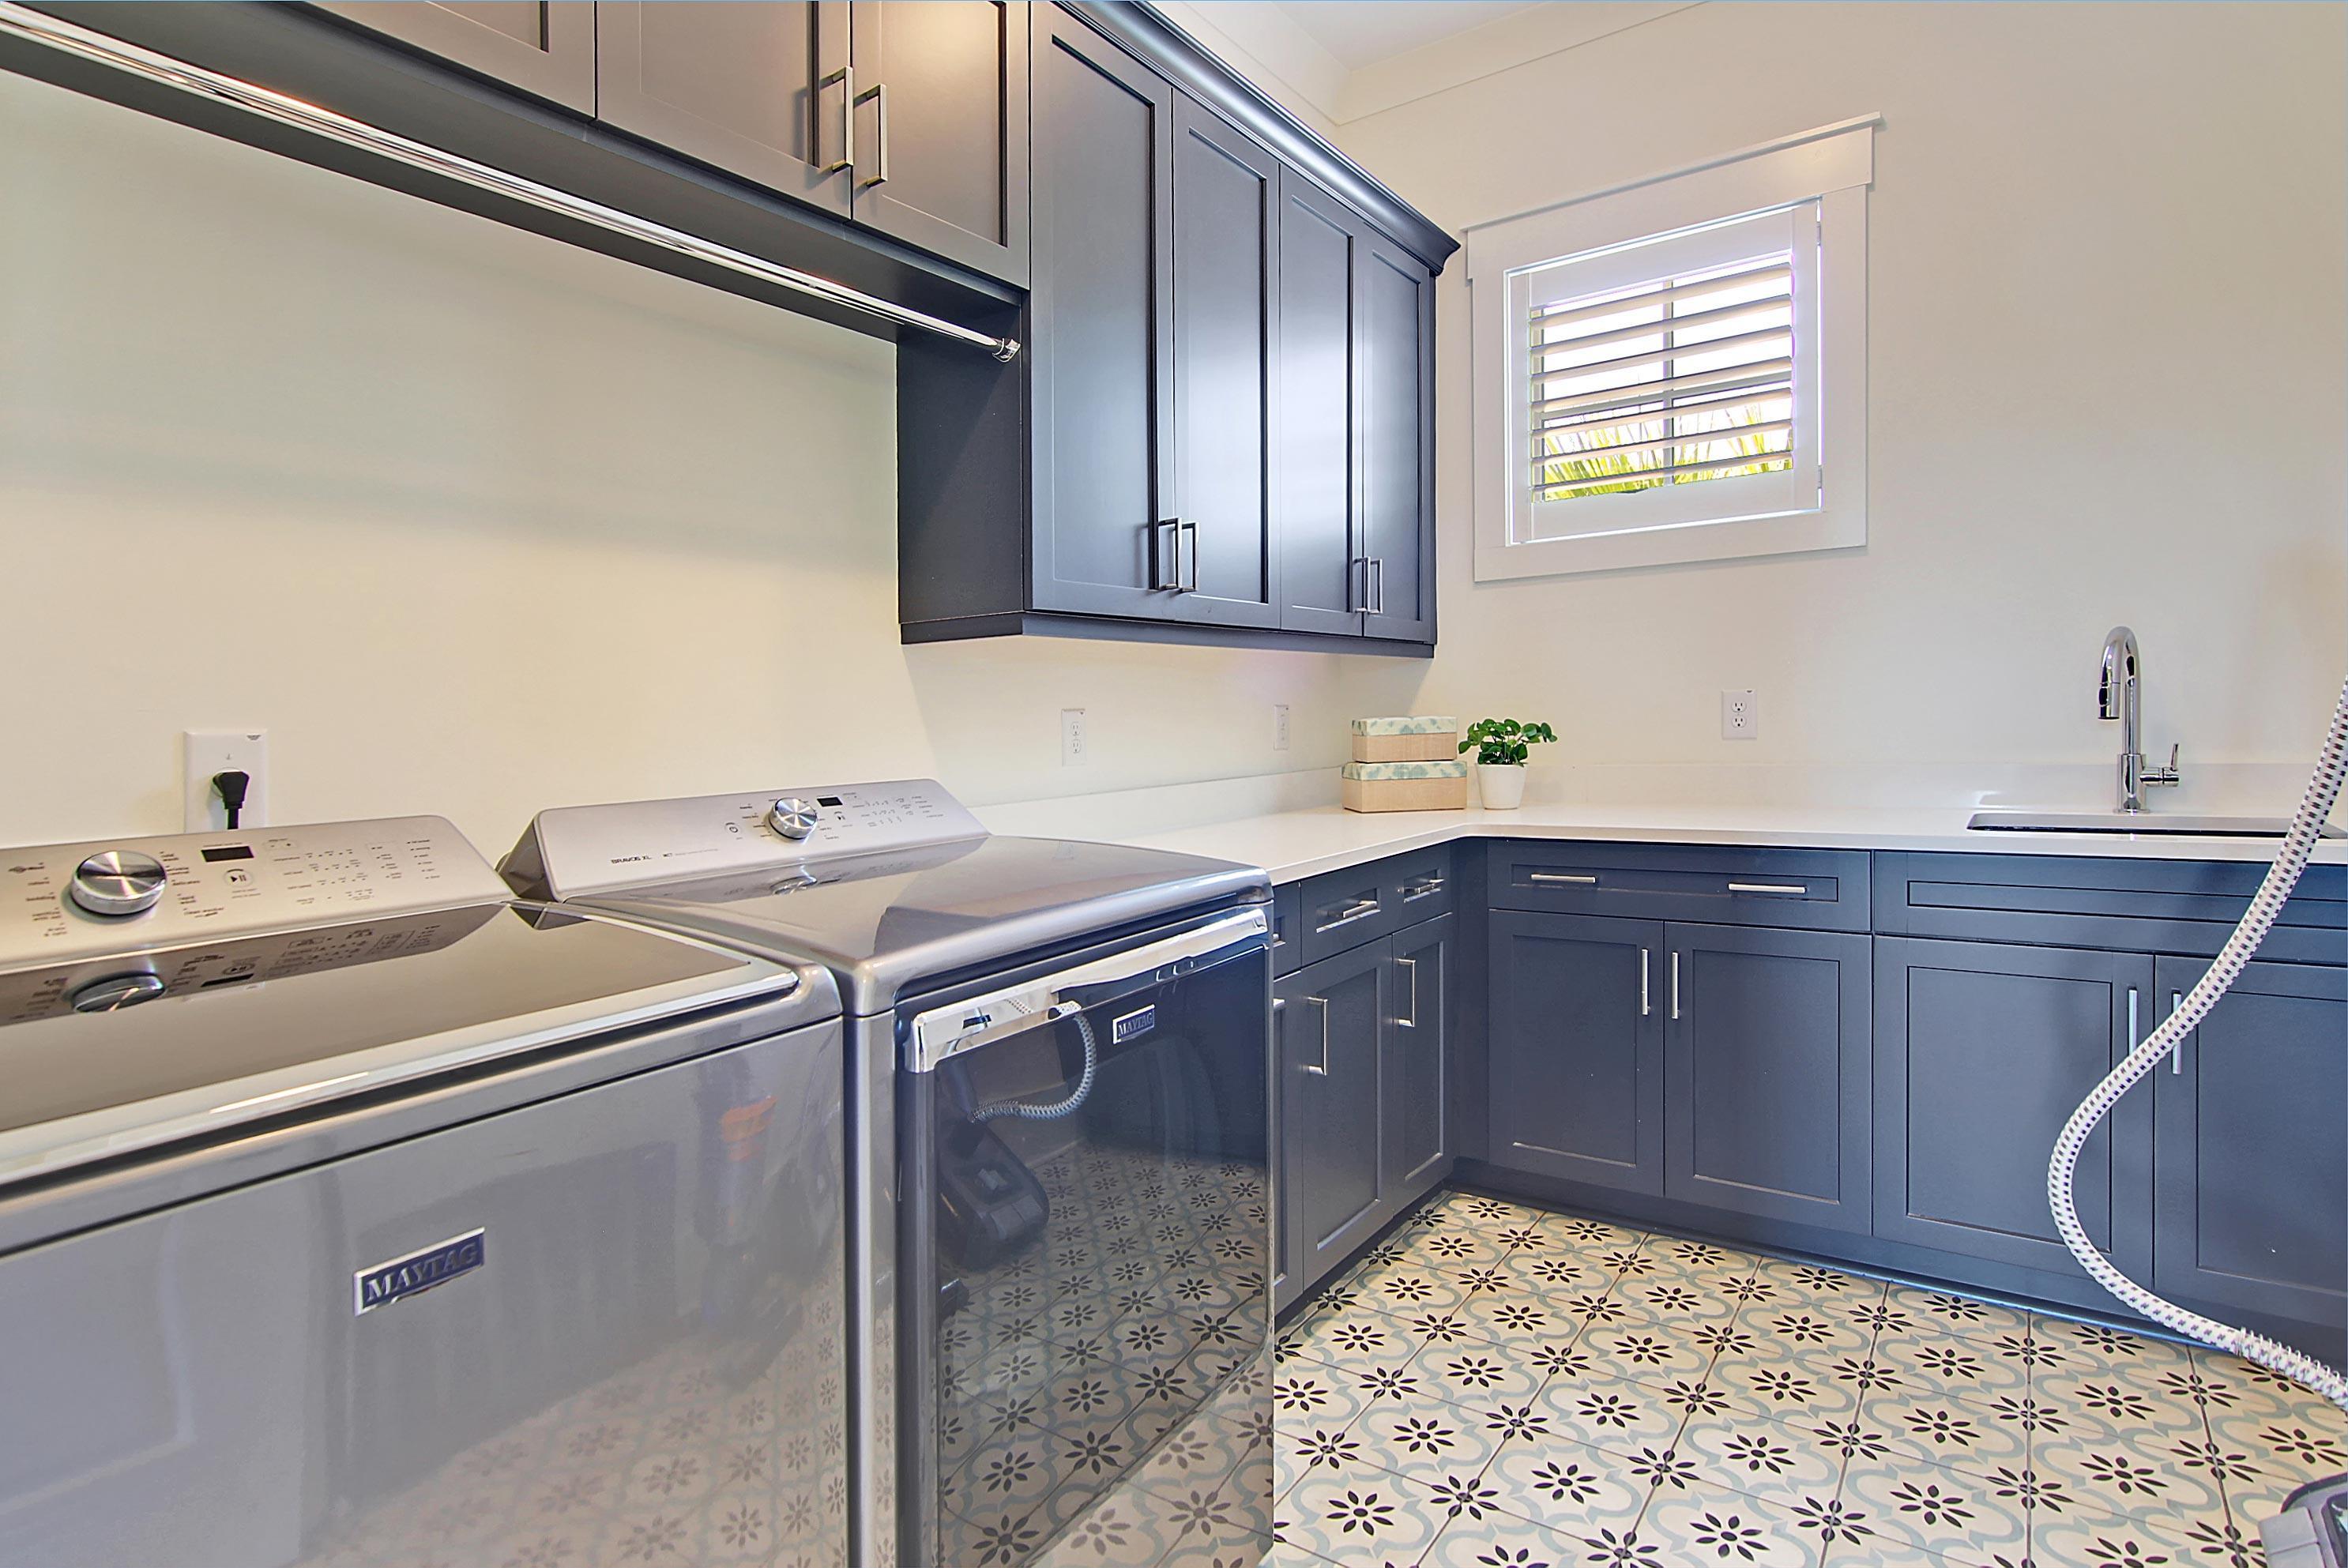 Dunes West Homes For Sale - 2456 Darts Cove, Mount Pleasant, SC - 63